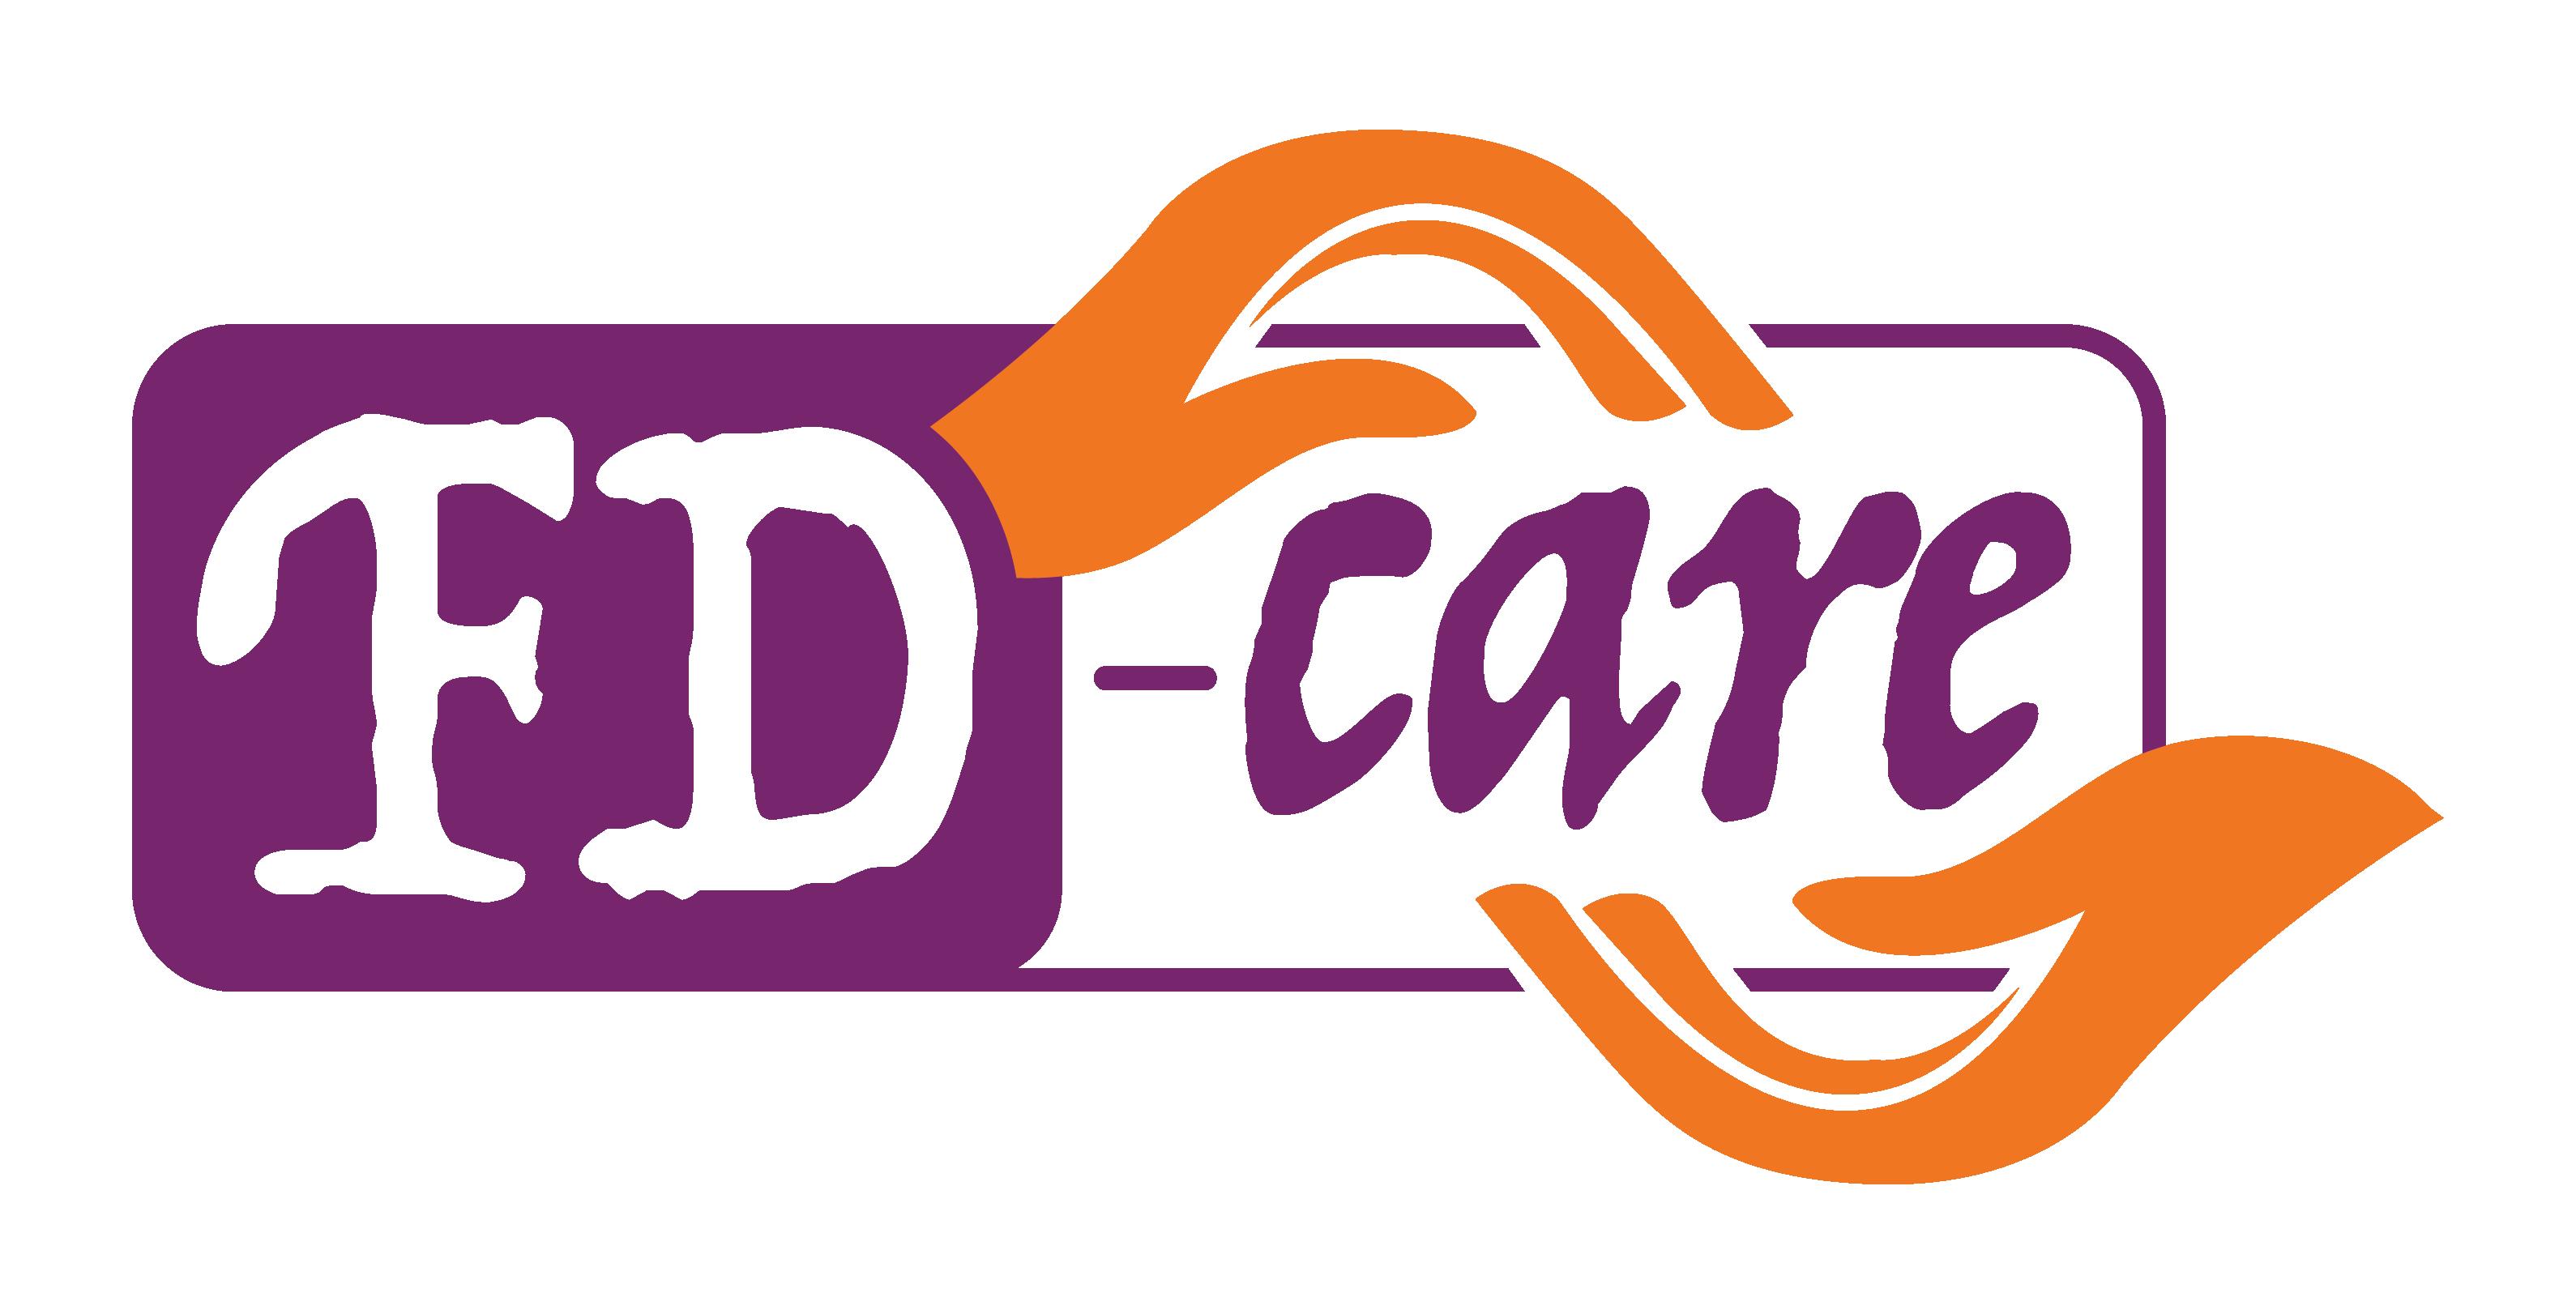 FD-care logo